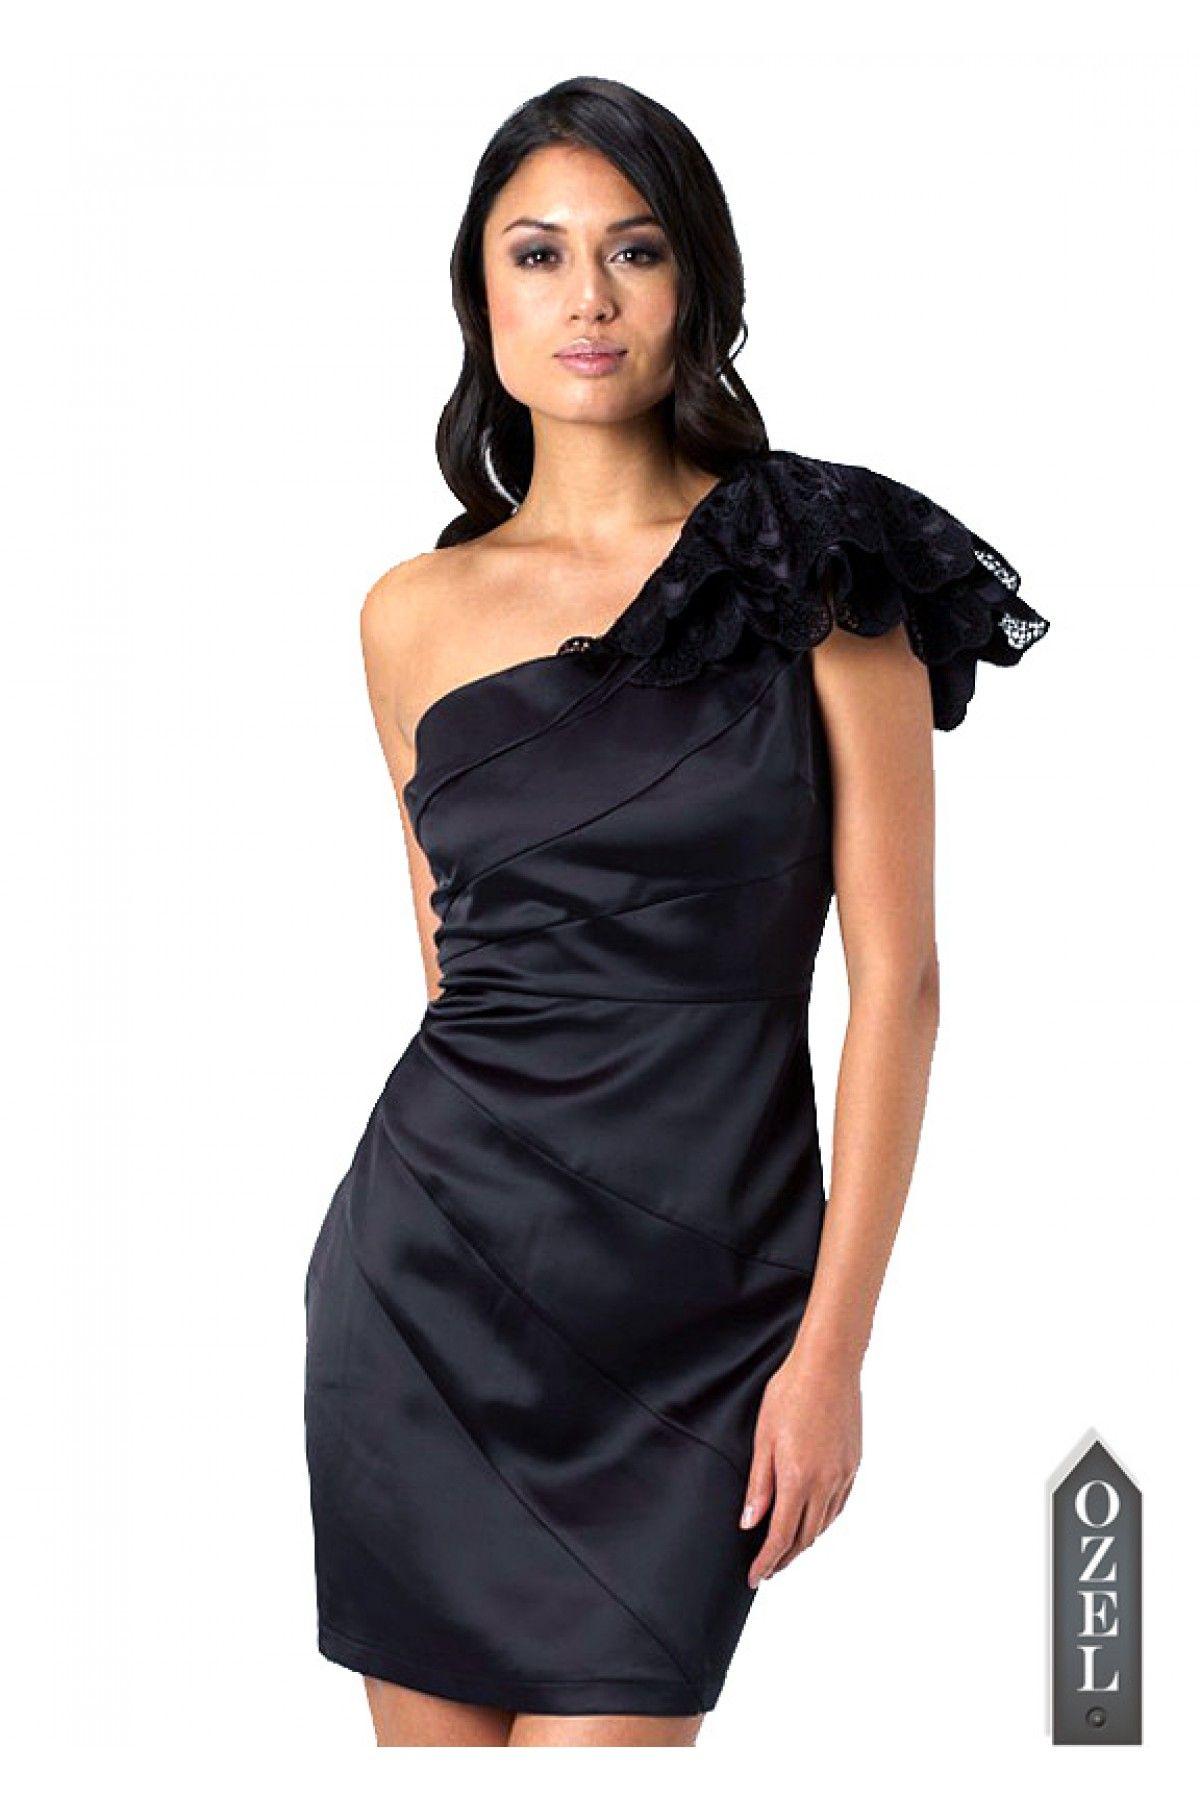 Lipsy One Shoulder Cocktail Dress by Ozel Studio